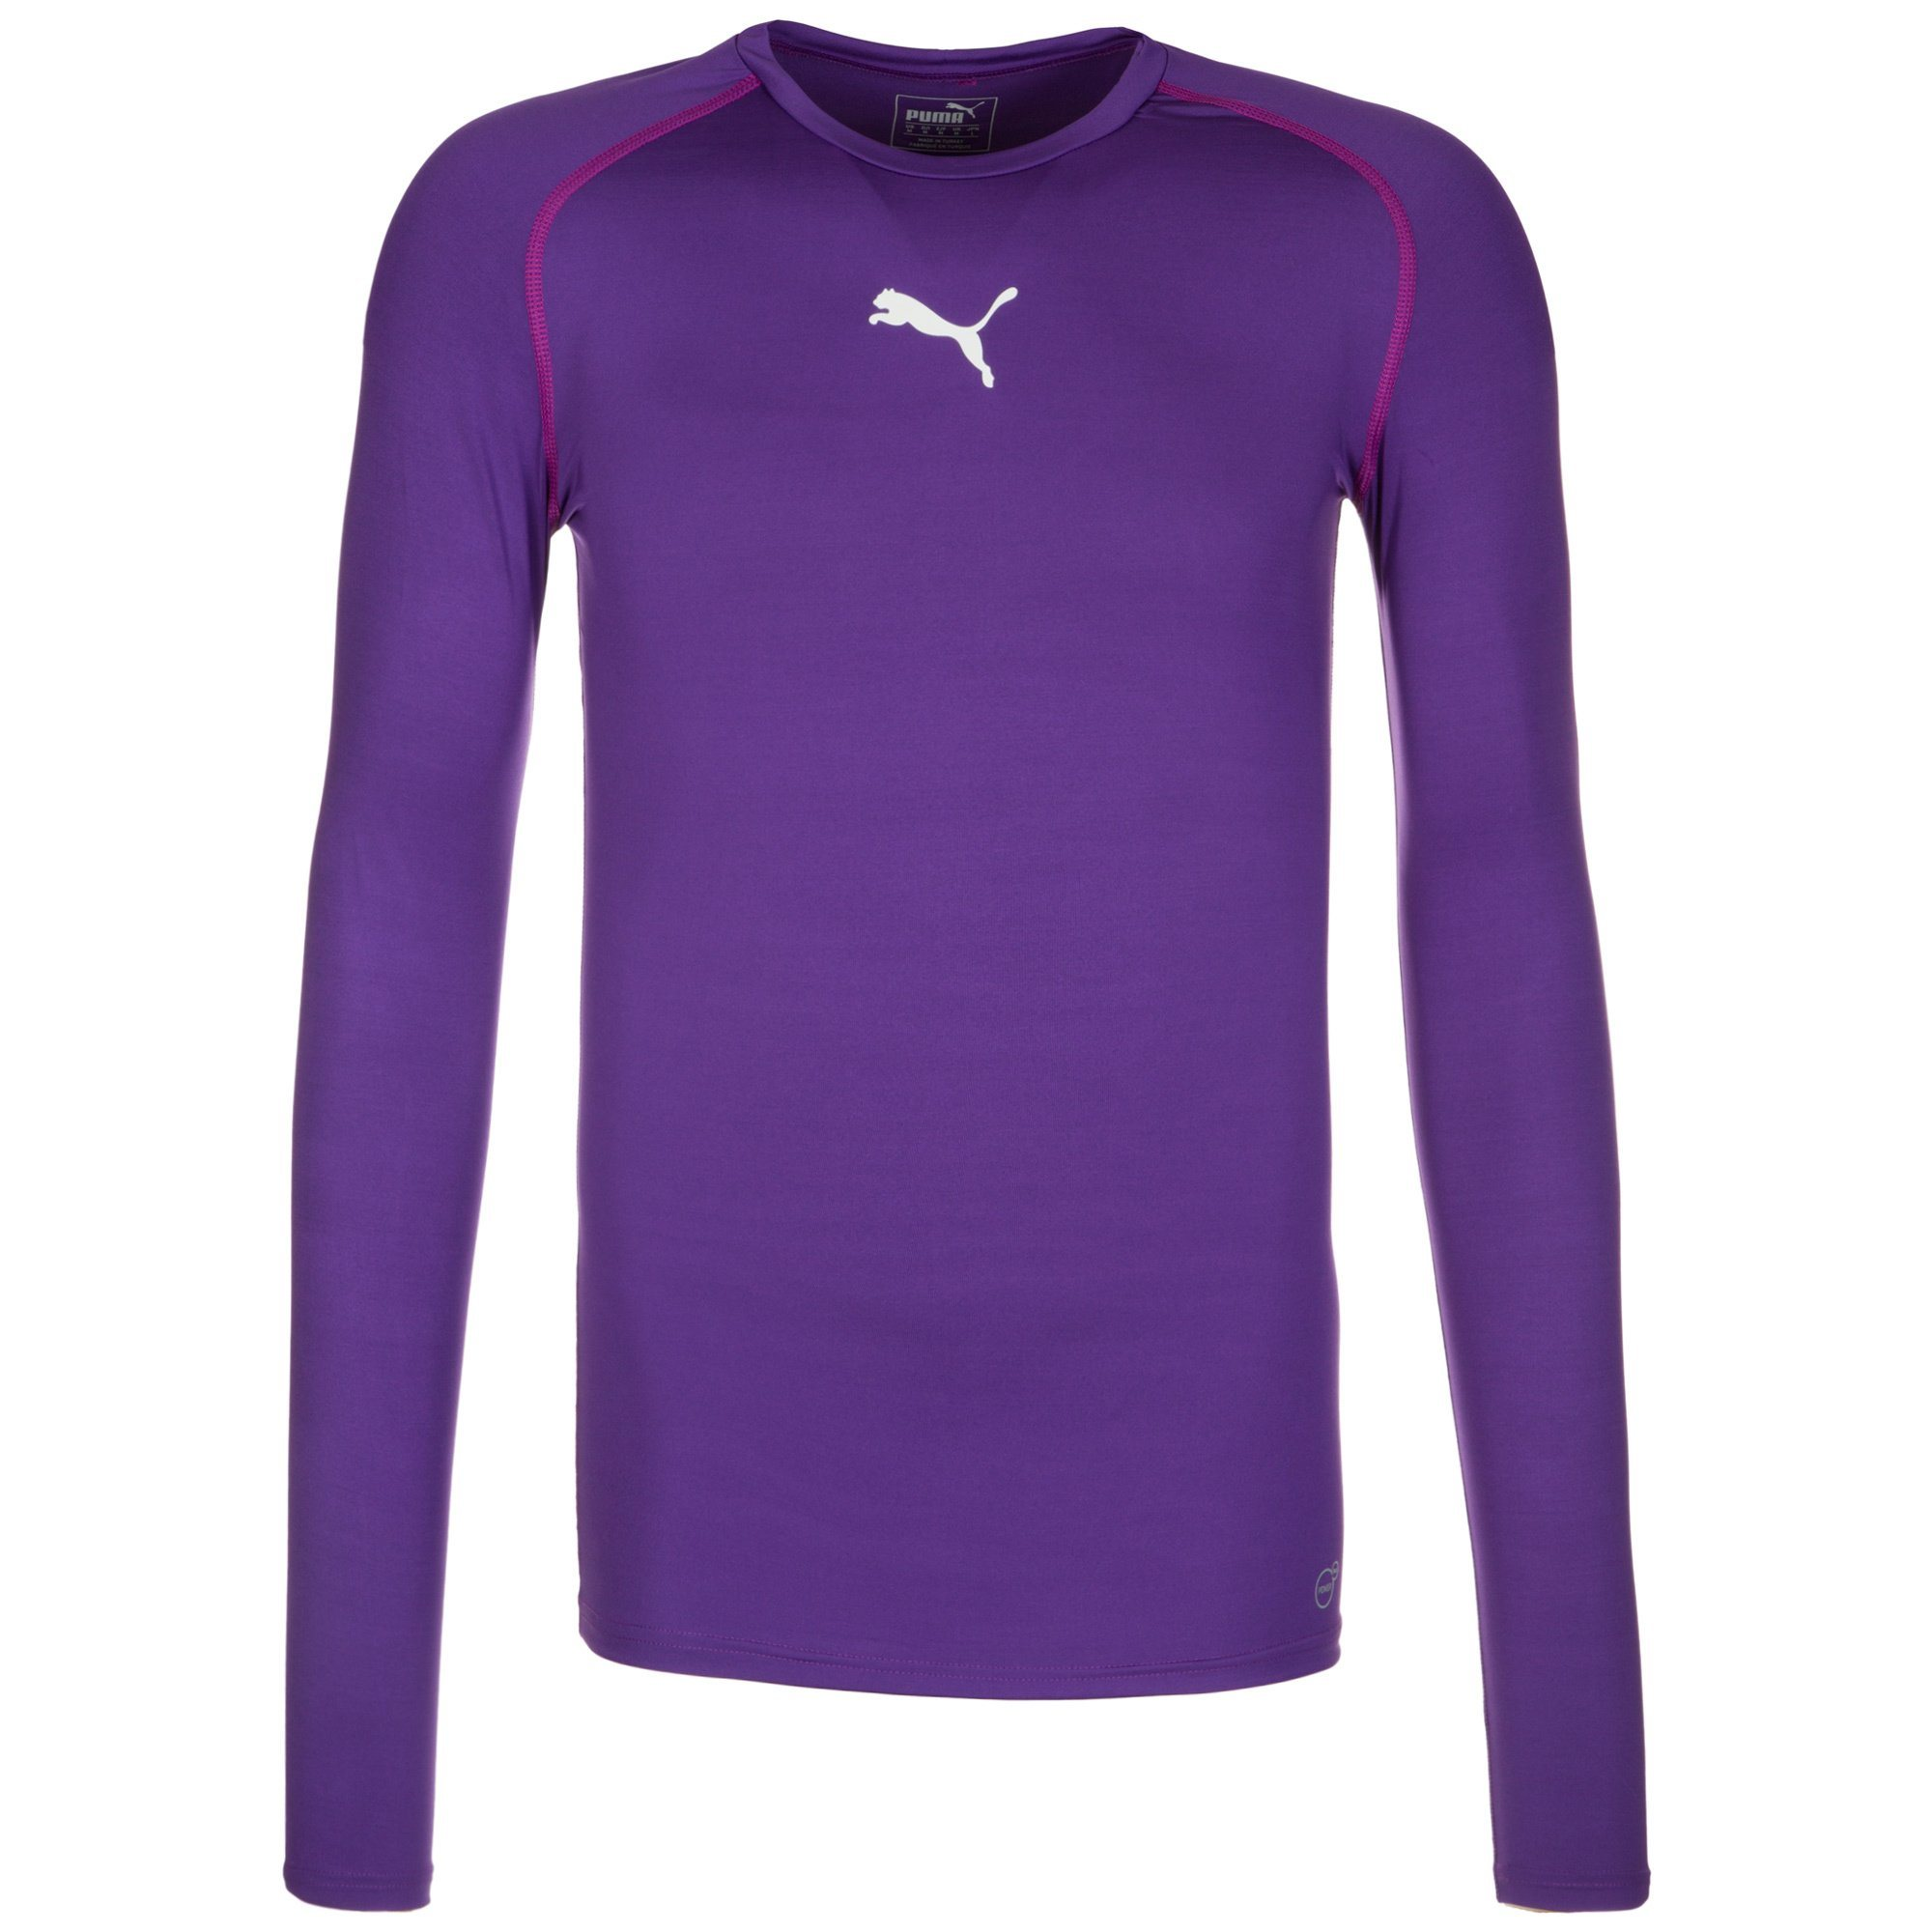 PUMA TB Trainingsshirt Herren   Sportbekleidung > Sportshirts > Funktionsshirts   Lila   Polyester - Elasthan   PUMA